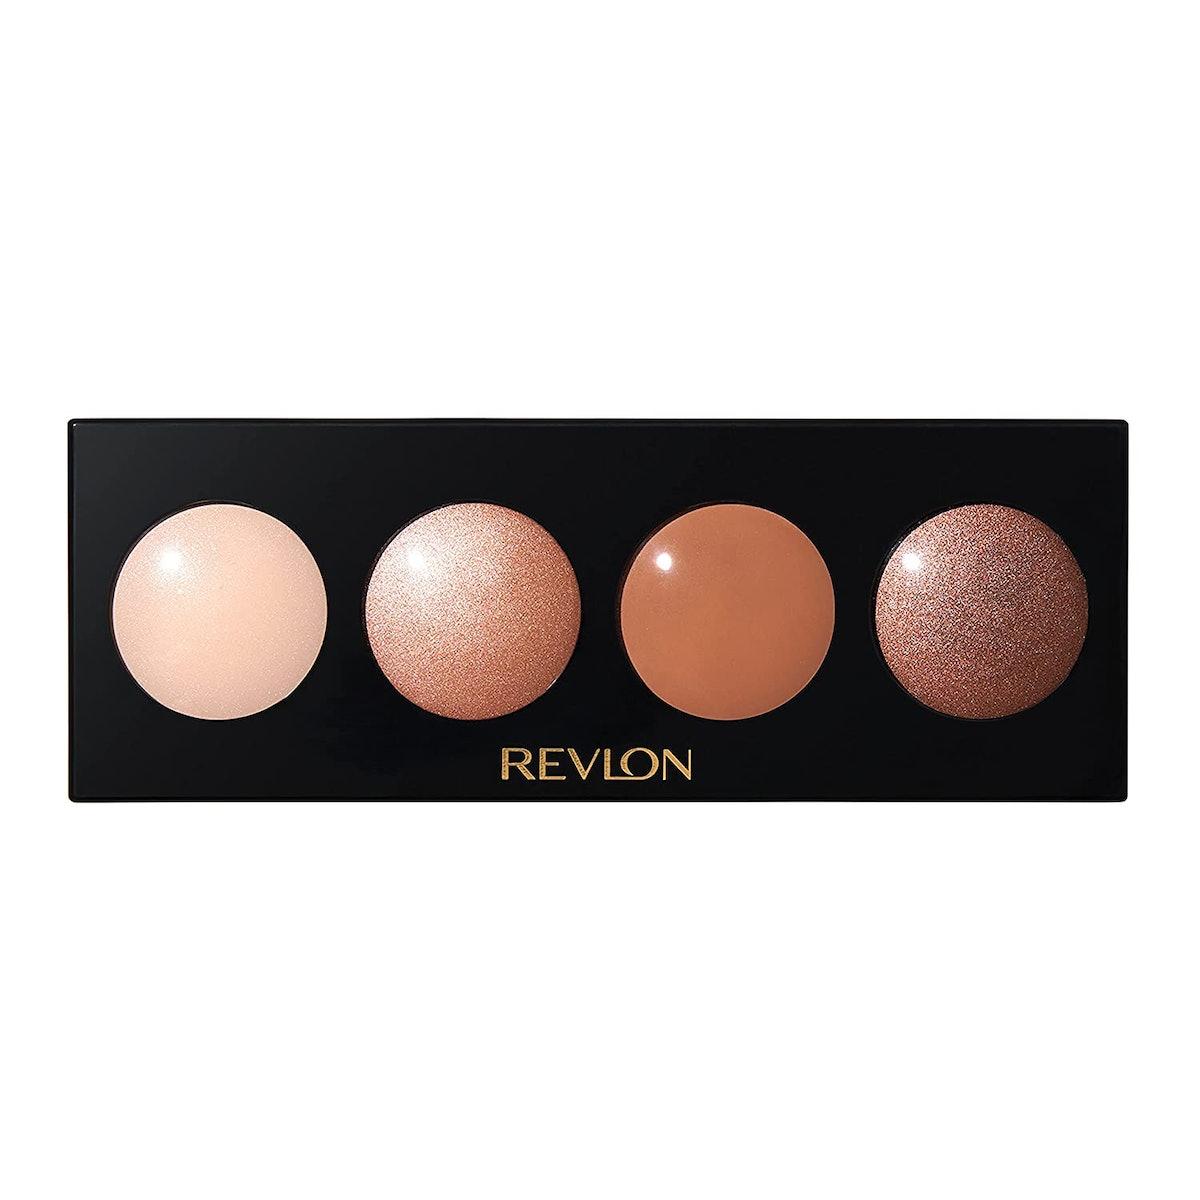 Revlon Illuminance Crème Shadow